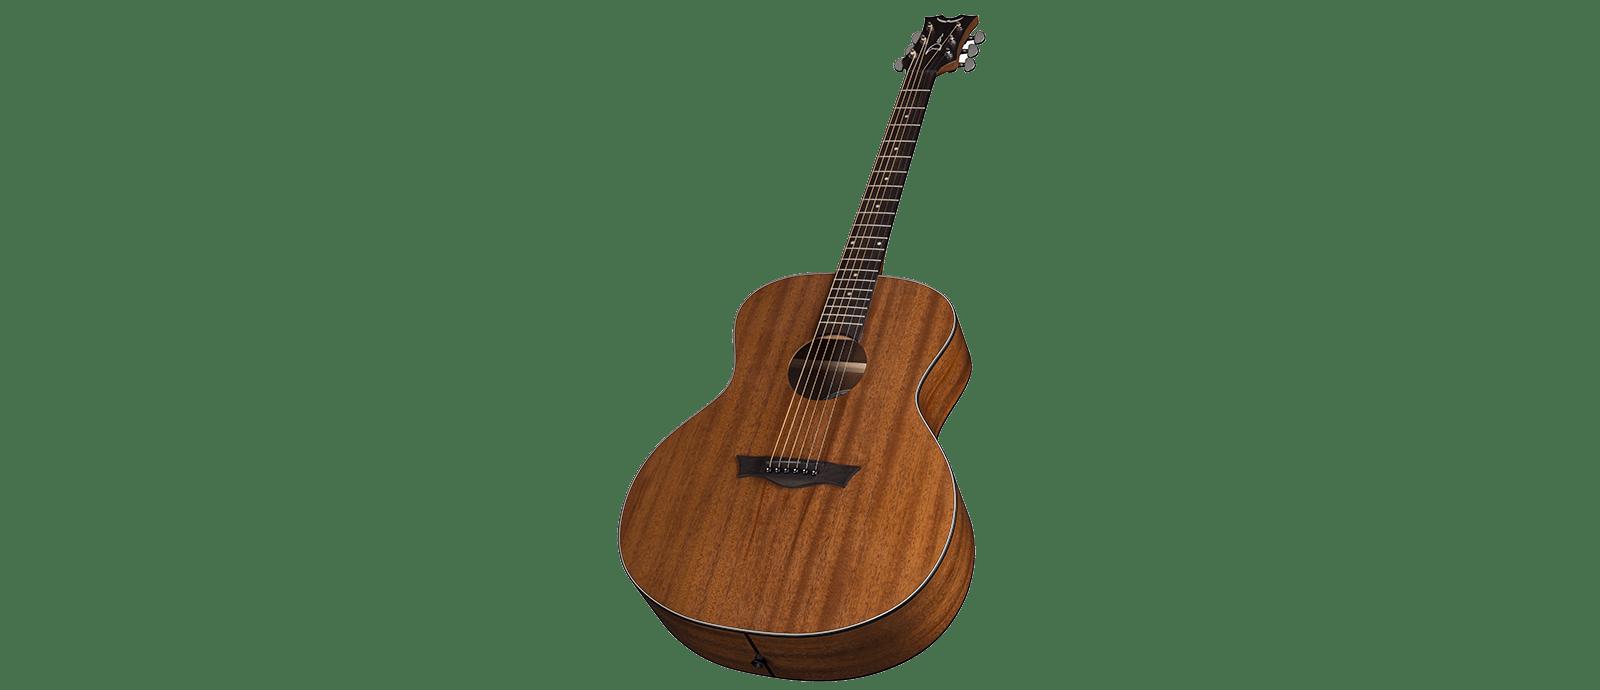 clipart royalty free stock Banjo clipart western guitar. Axs grand auditorium mahogany.